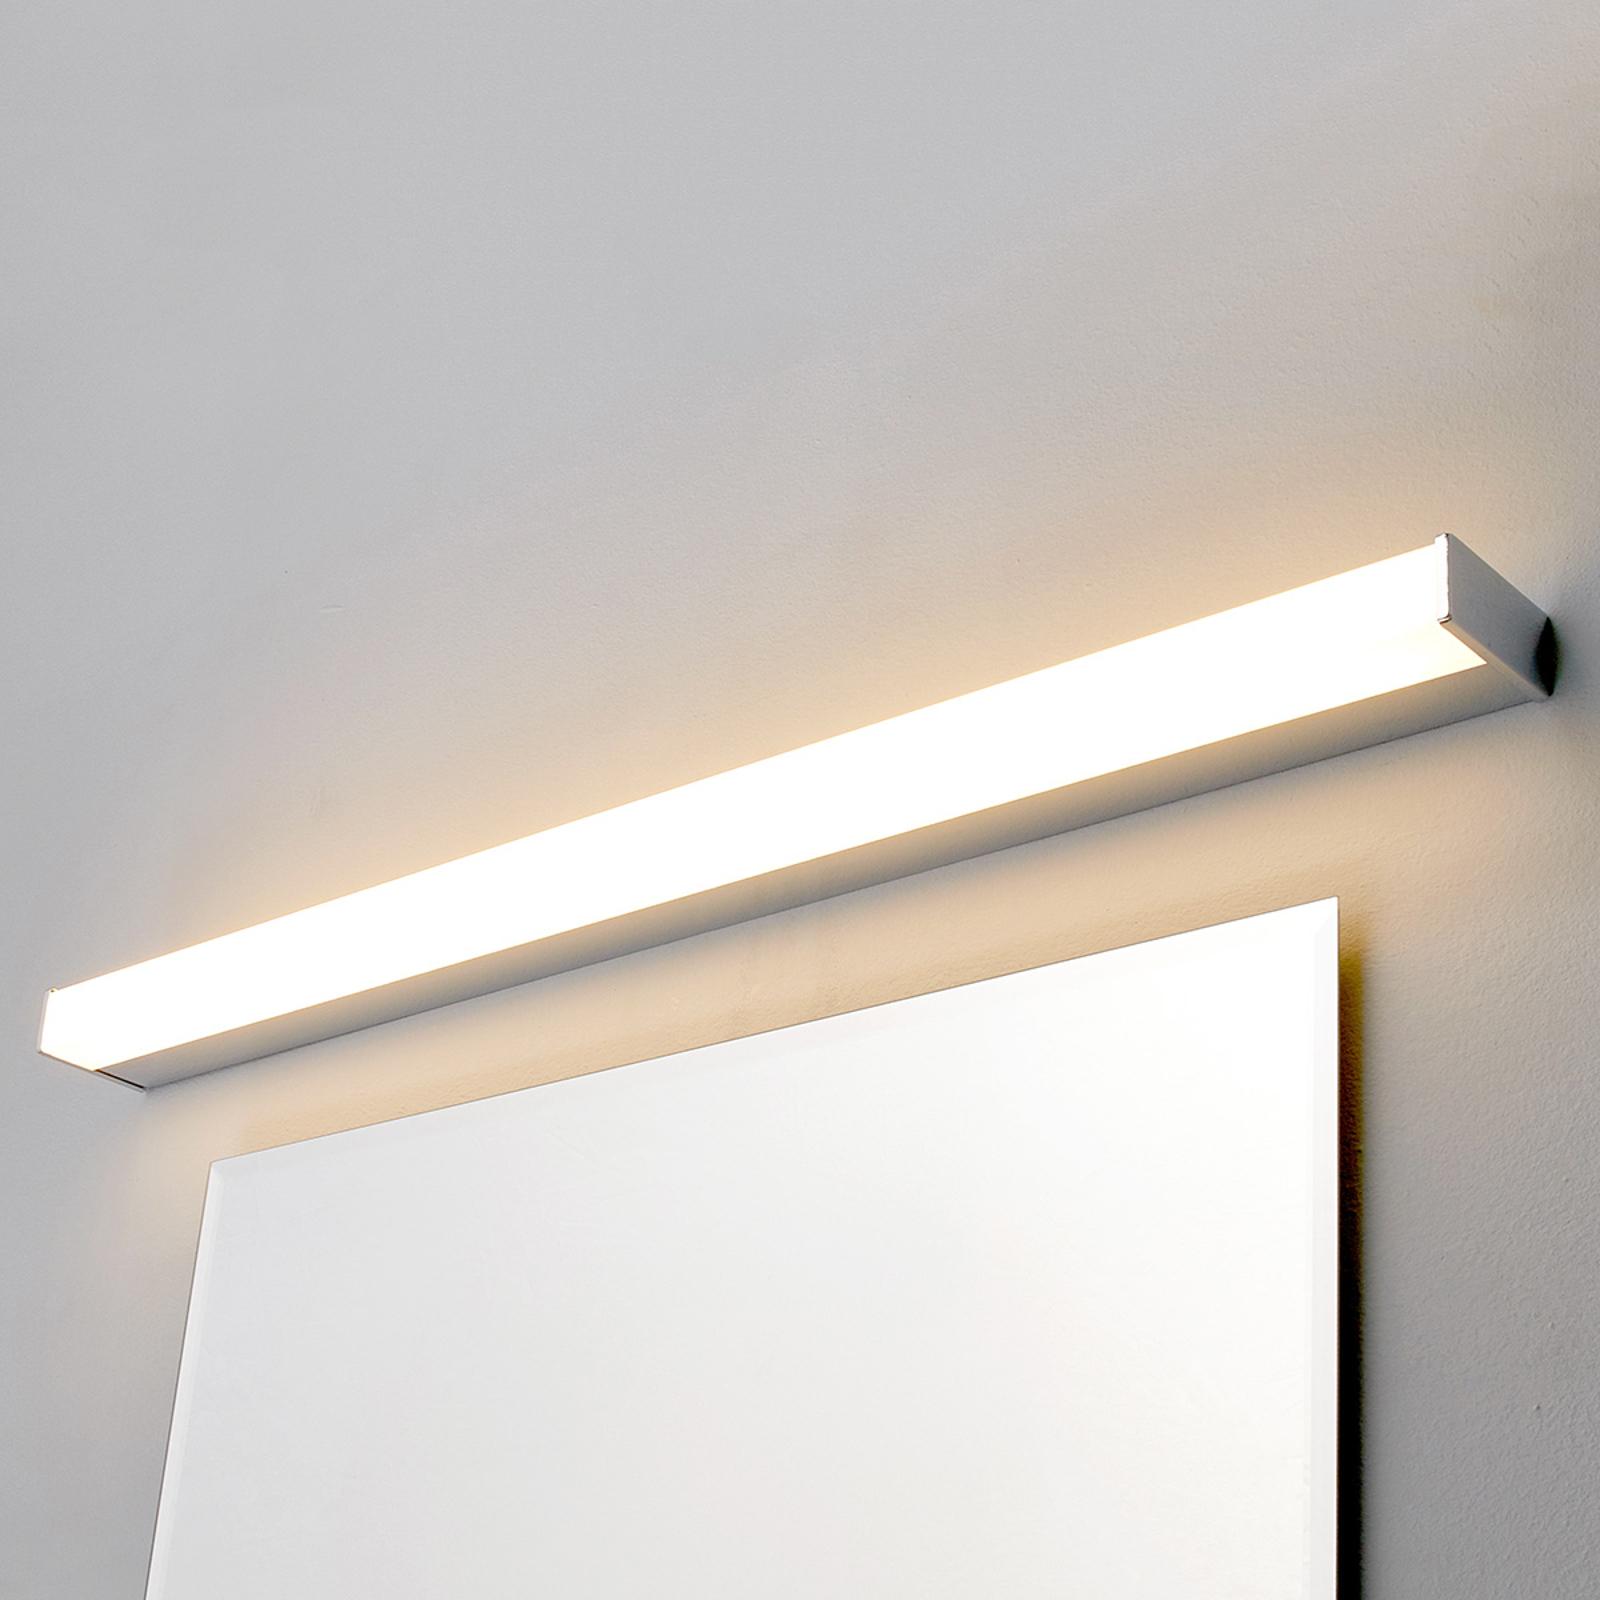 Lampada LED Philippa da bagno, angolare 88cm